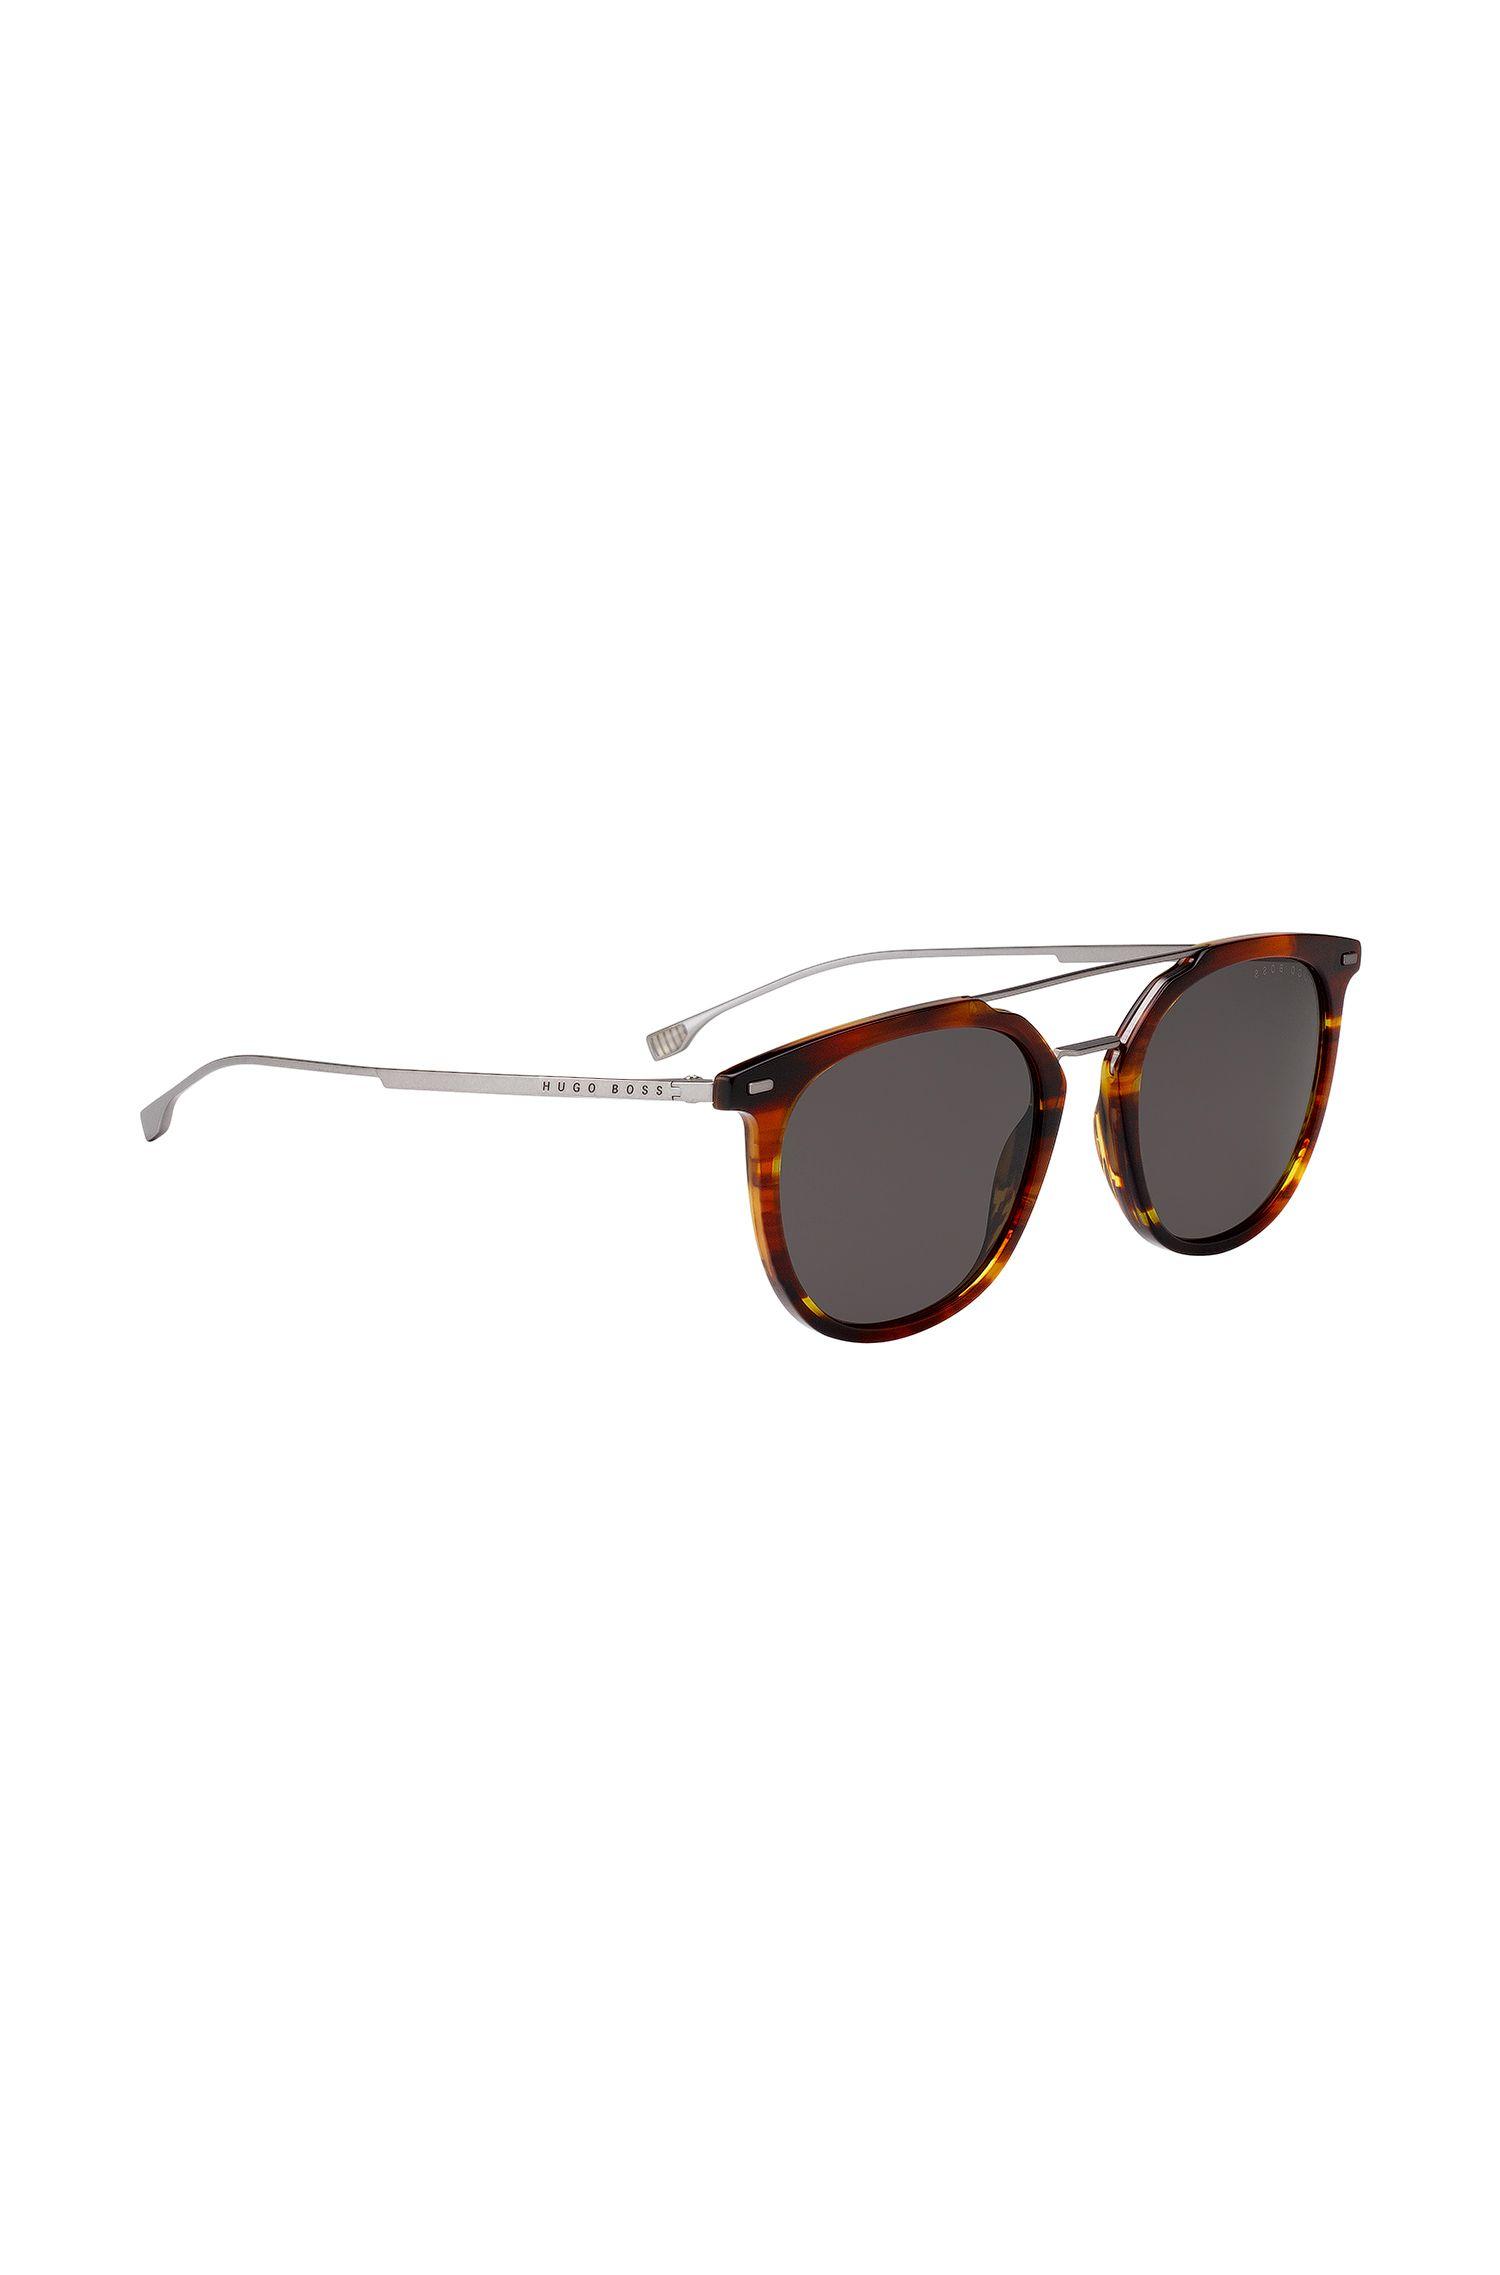 Double-bridge sunglasses with Havana frames, Brown